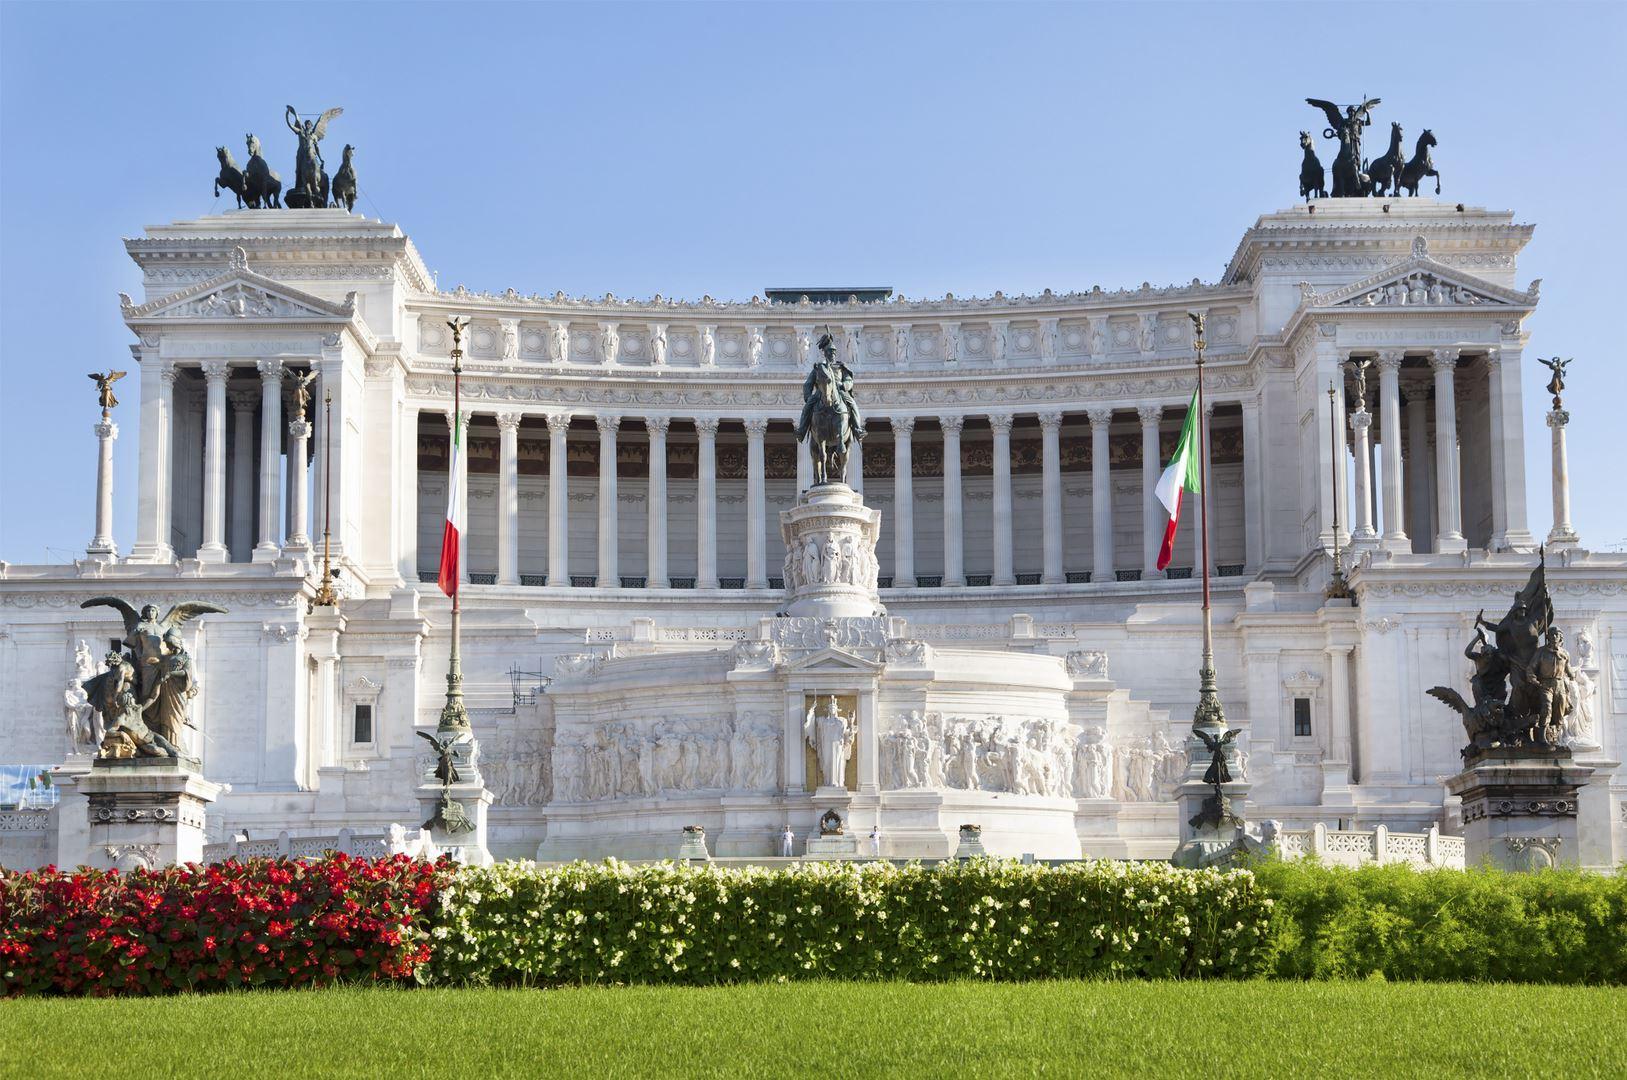 Wedding Cake Monument Rome Italy